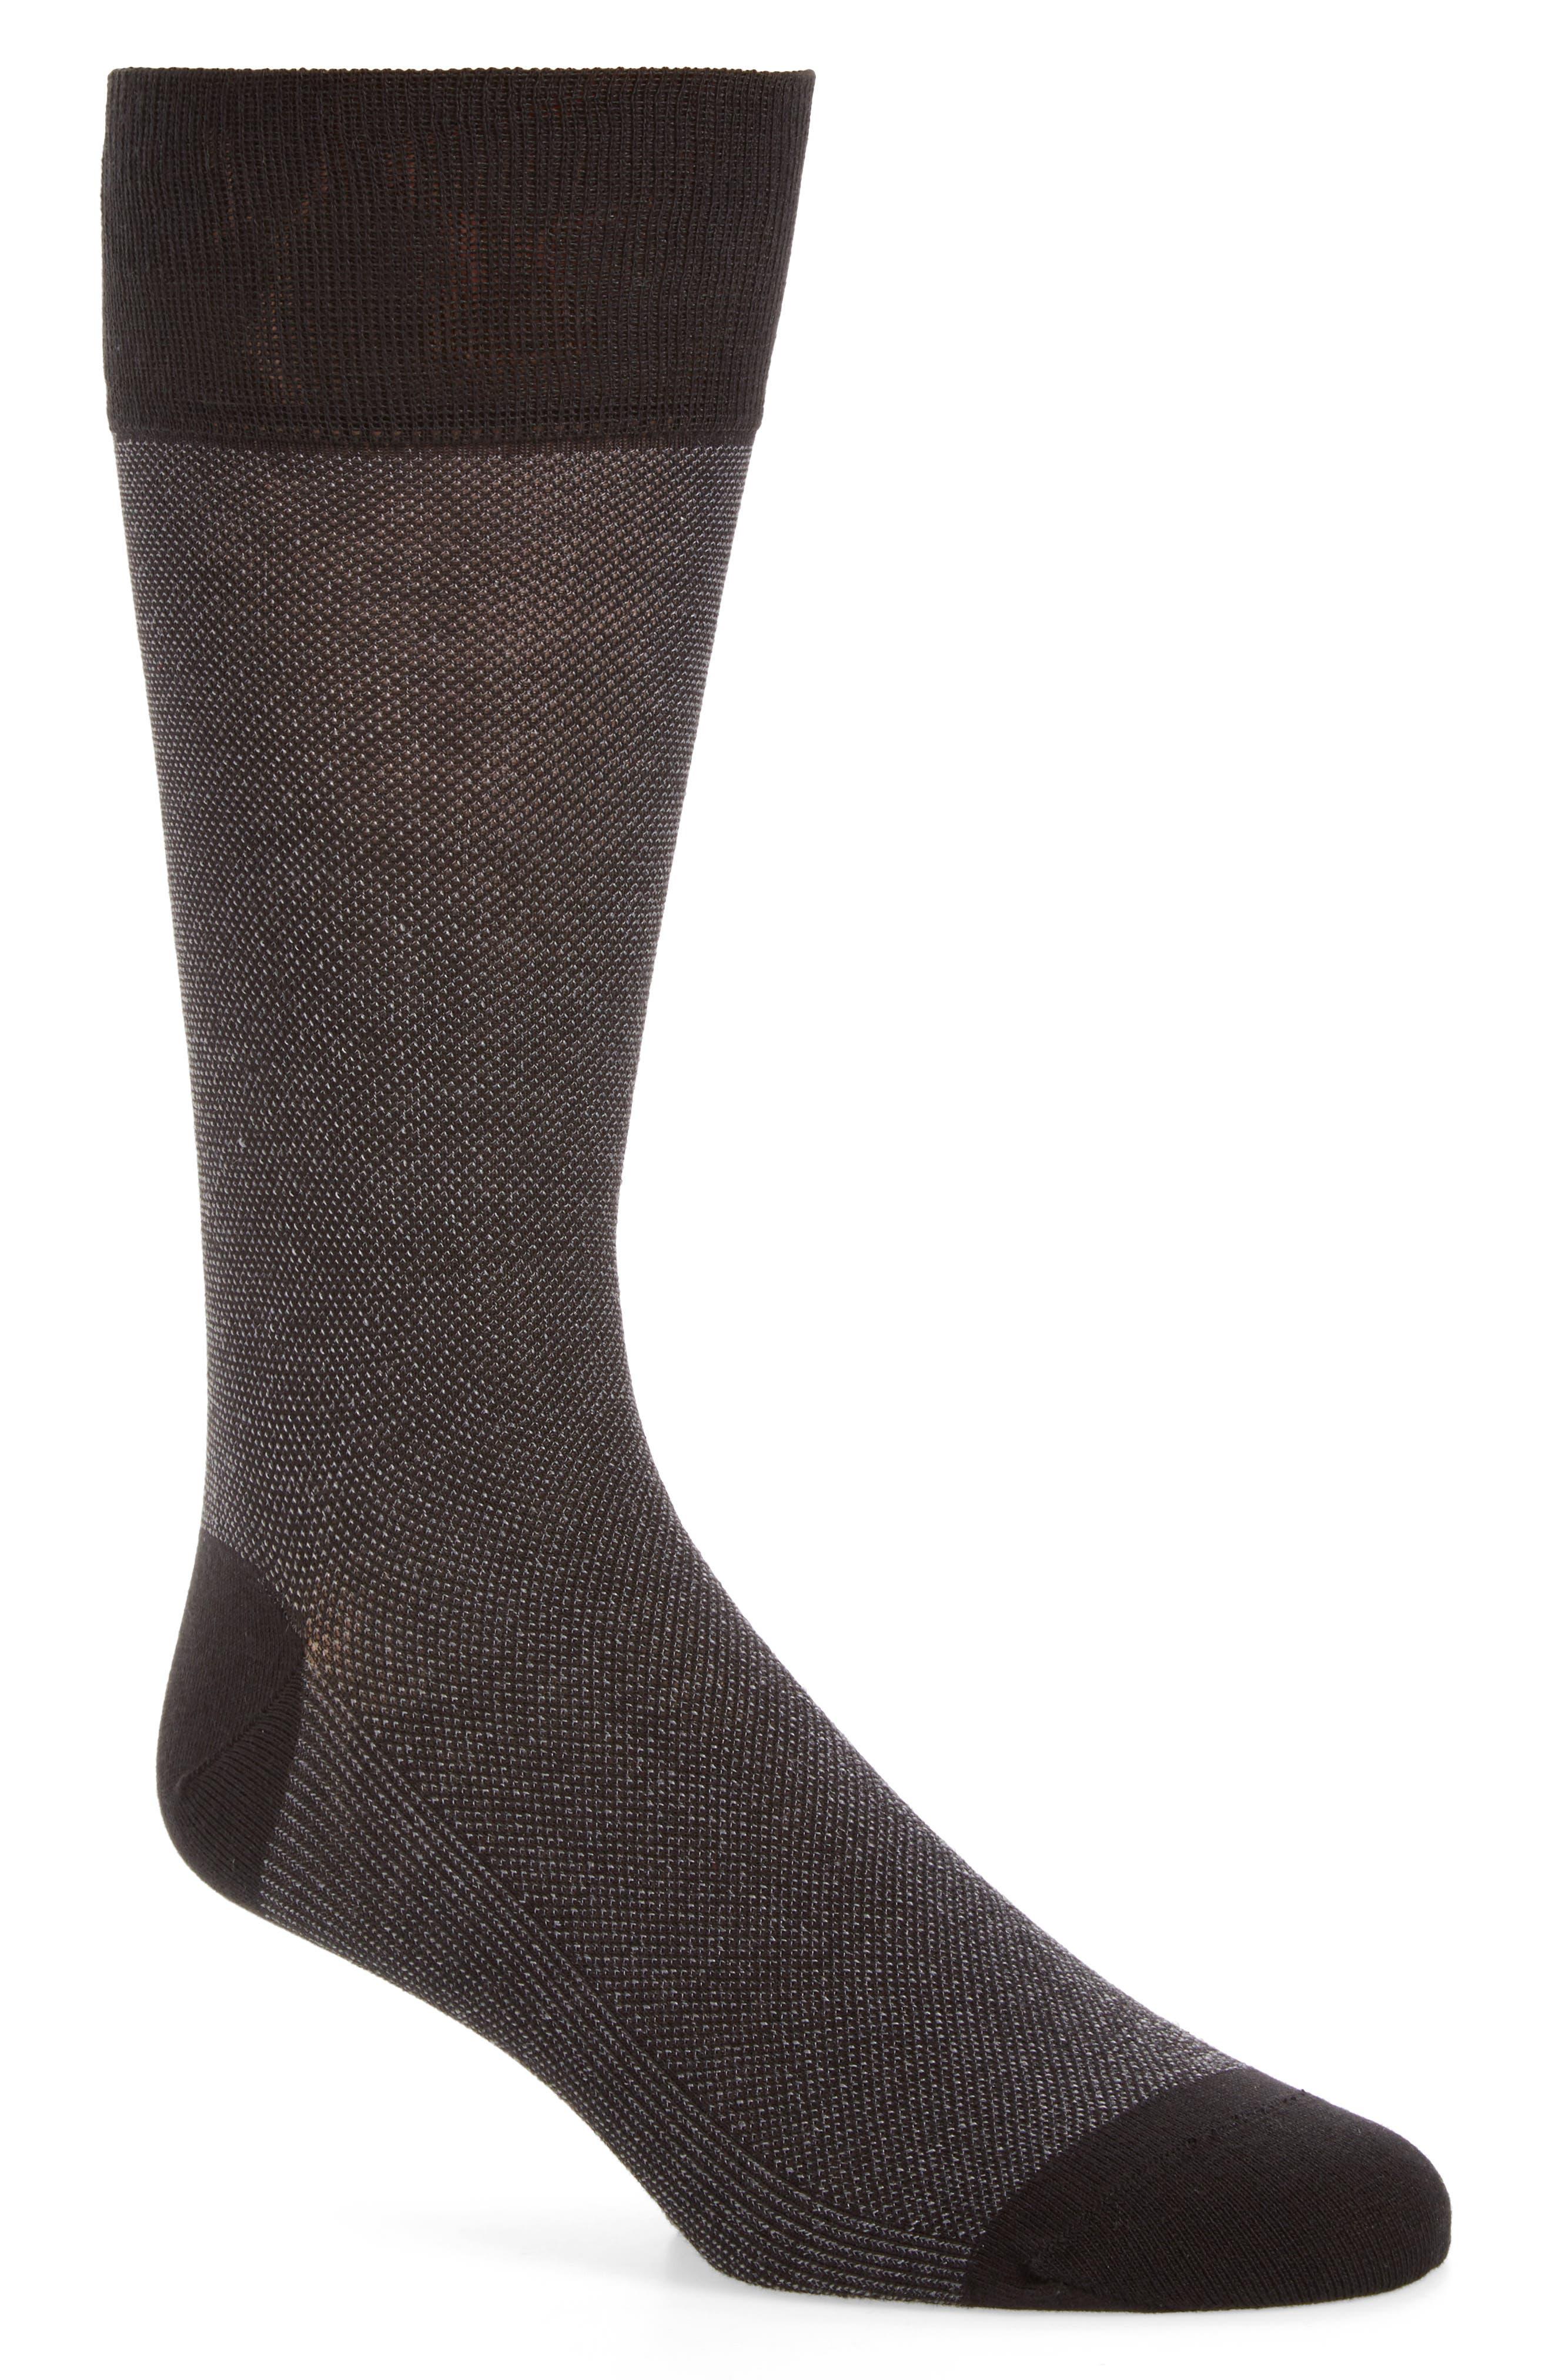 Piqué Texture Crew Socks,                         Main,                         color, BLACK